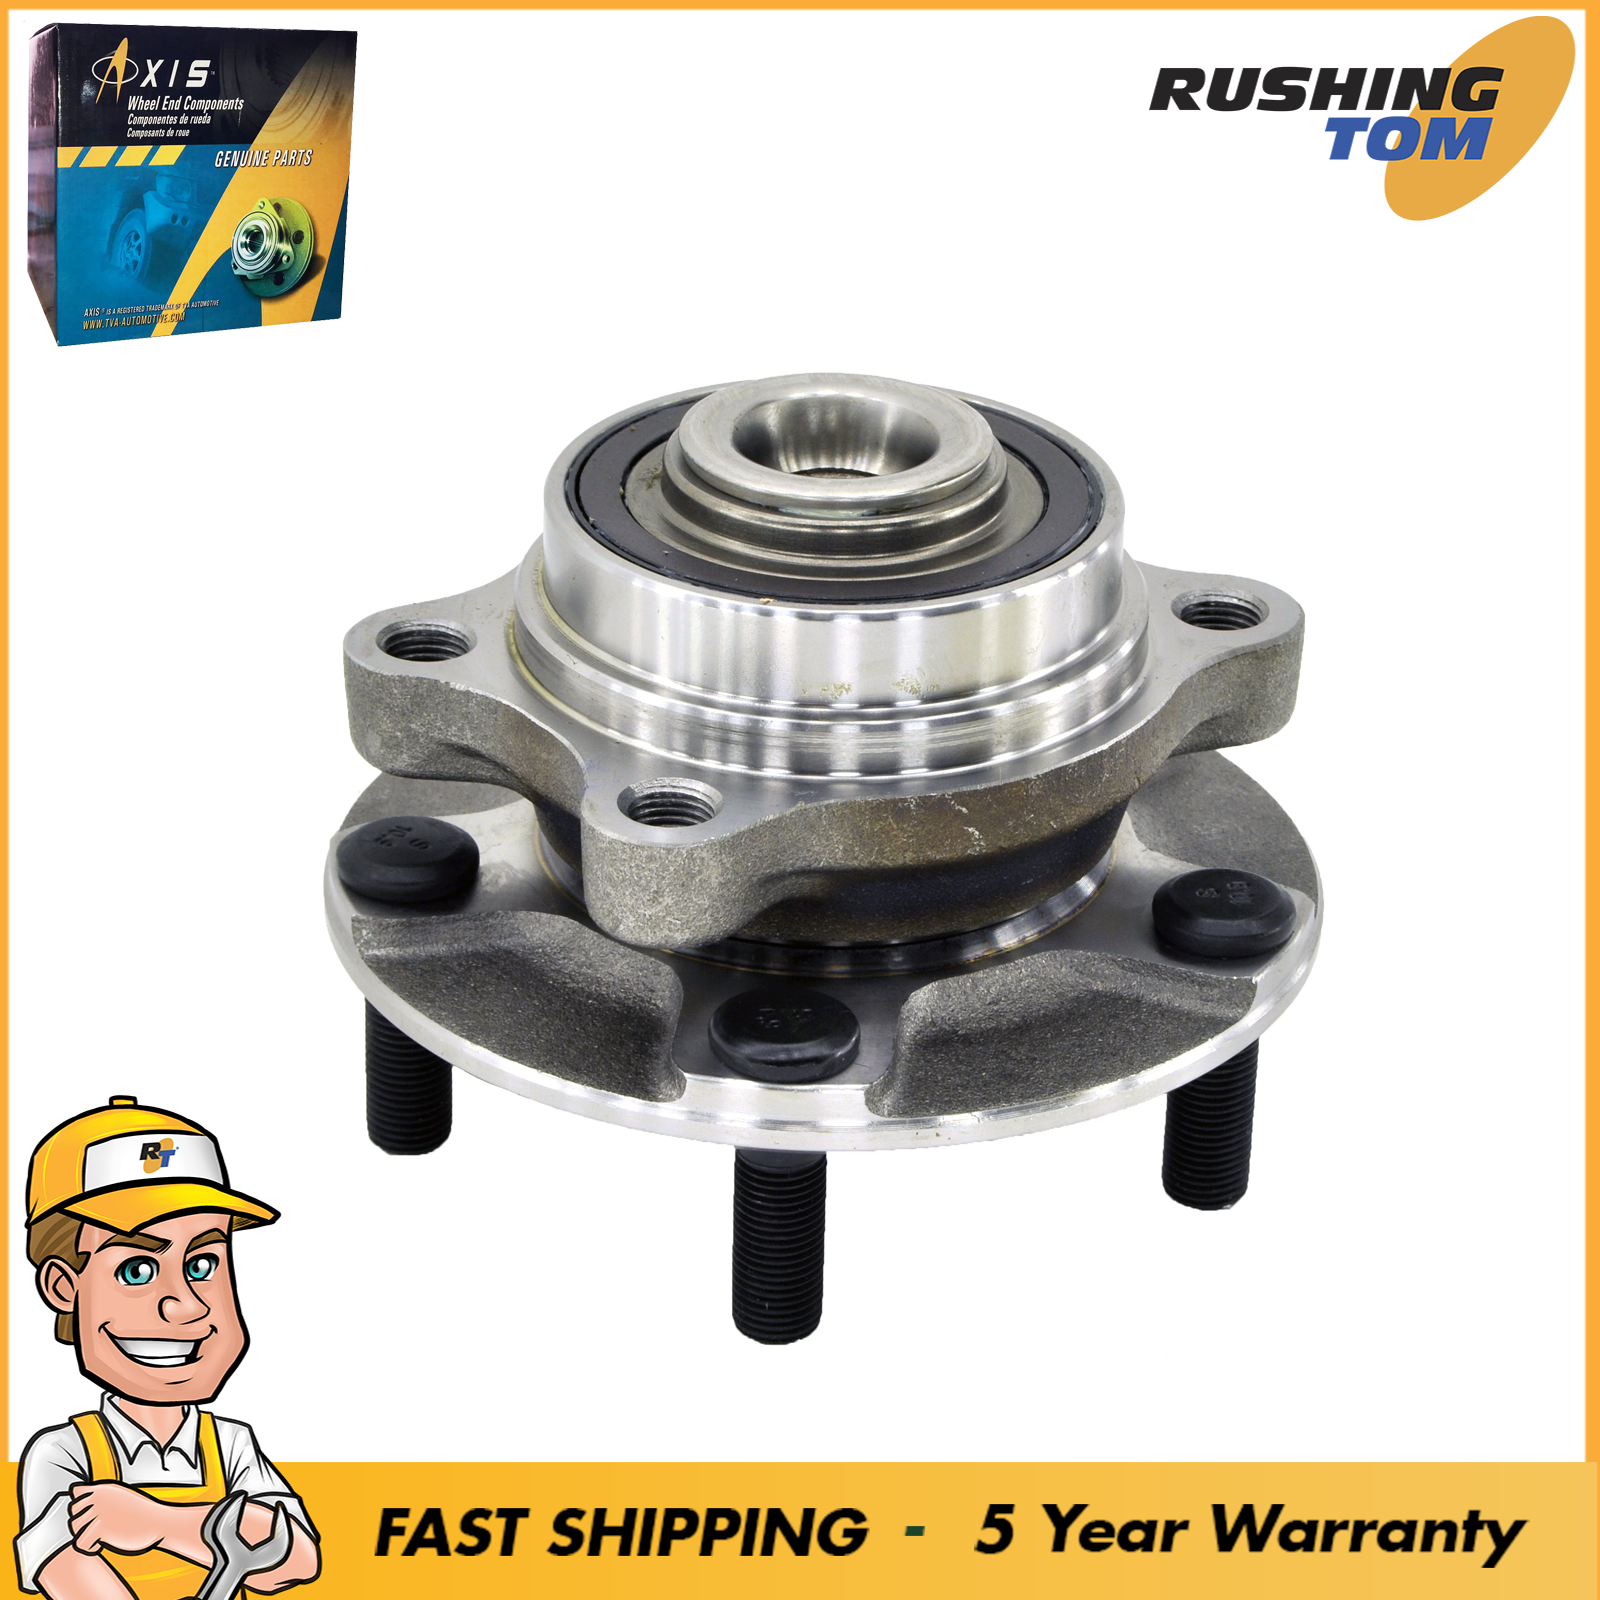 New Front Wheel Hub Bearing Assembly Fits 03-09 Nissan 350Z W/5 Year Warranty